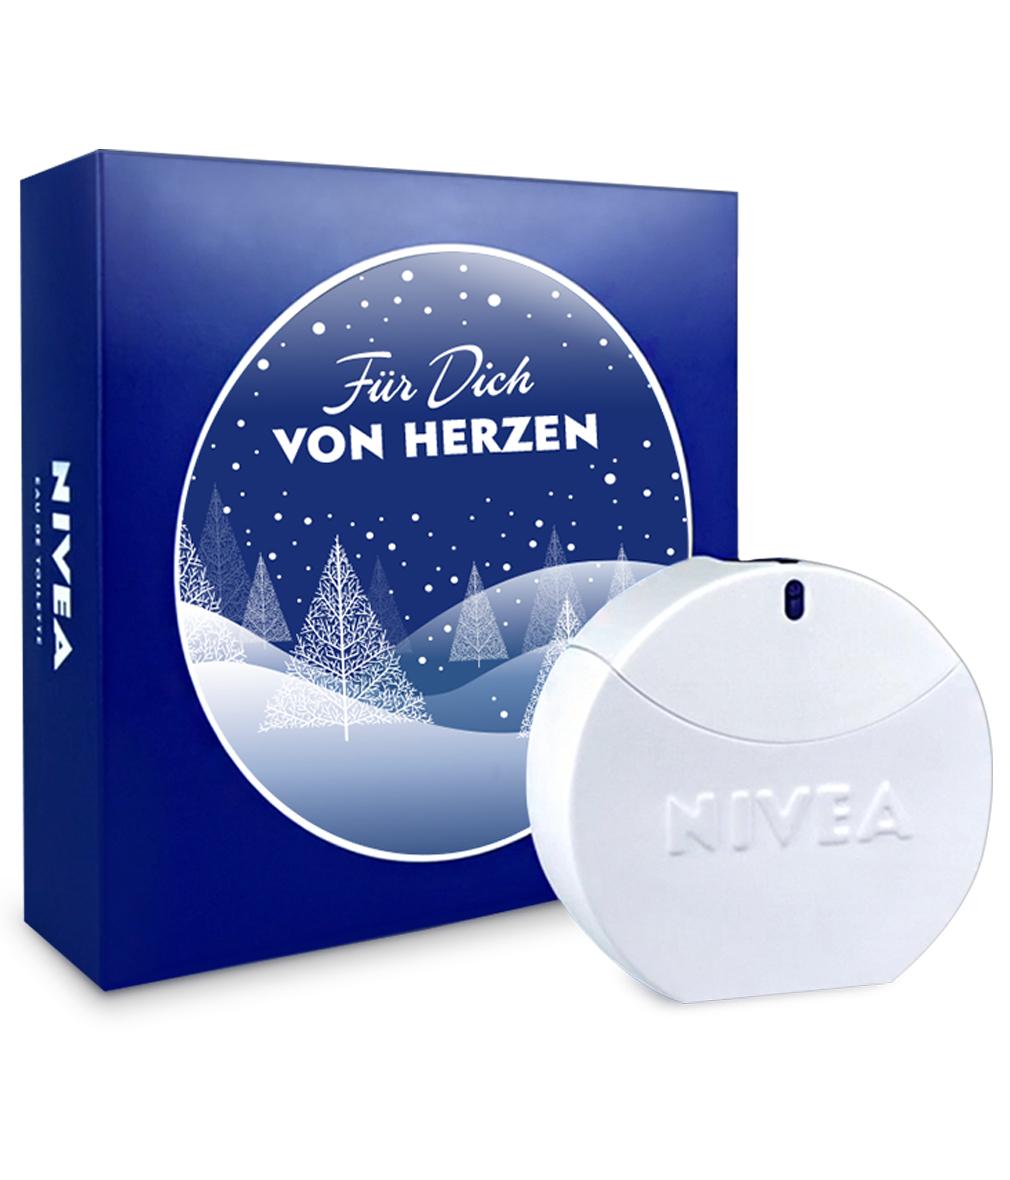 NIVEA Eau de Toilette Damen Parfum 30 ml XMAS Weihnachts Edition inkl. Einsteckkarte